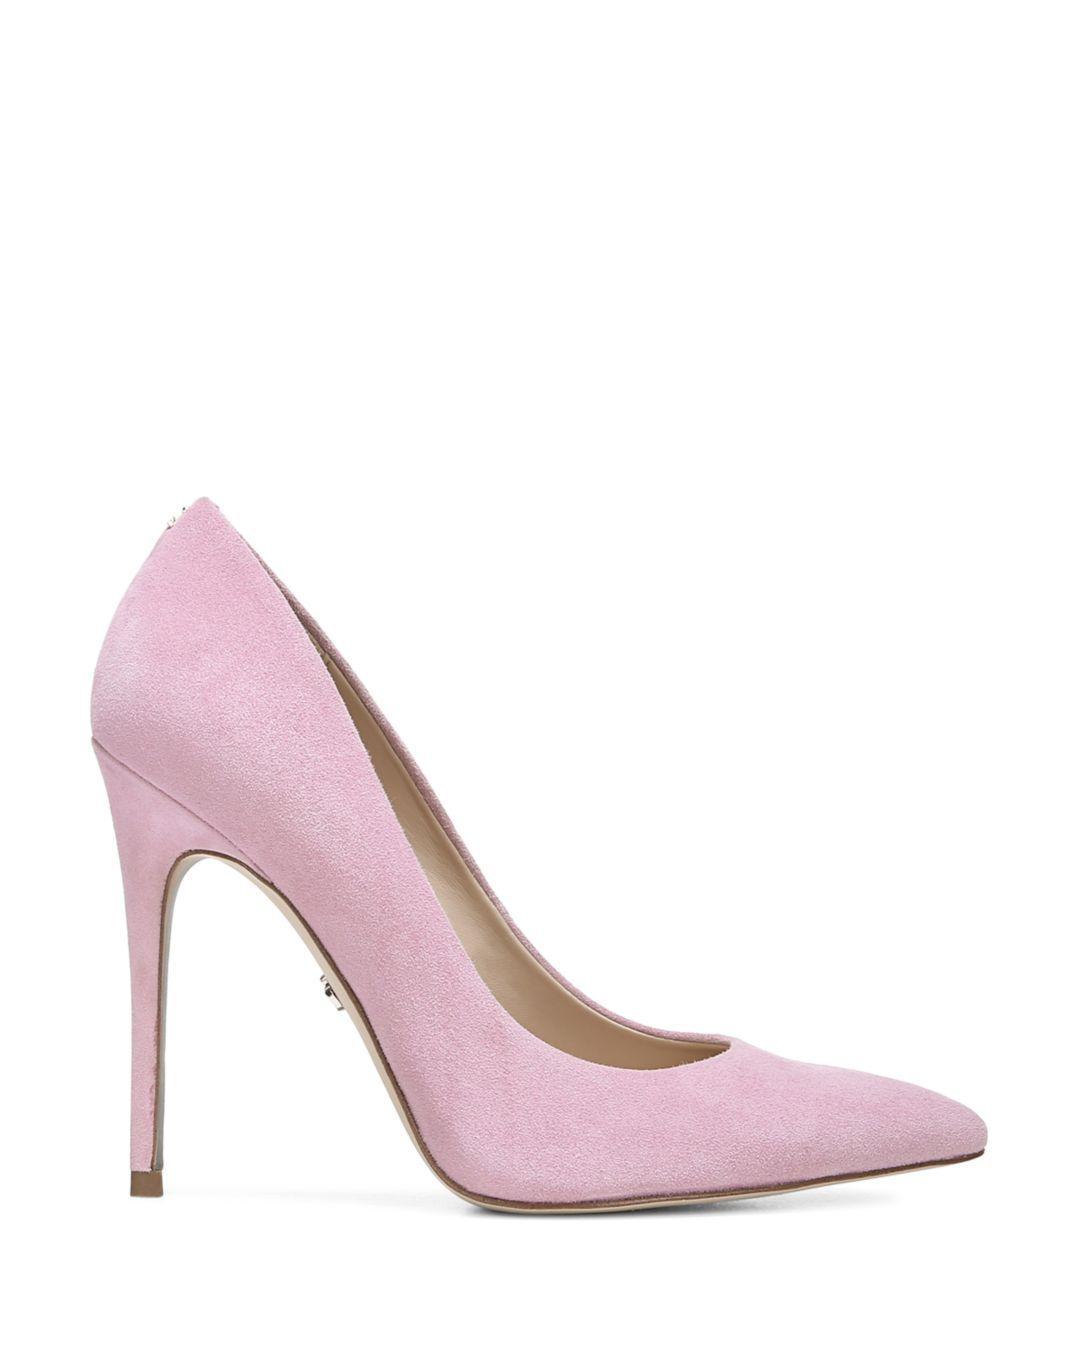 8ba9290d225e40 Lyst - Sam Edelman Women s Danna Stiletto High-heel Pumps in Pink